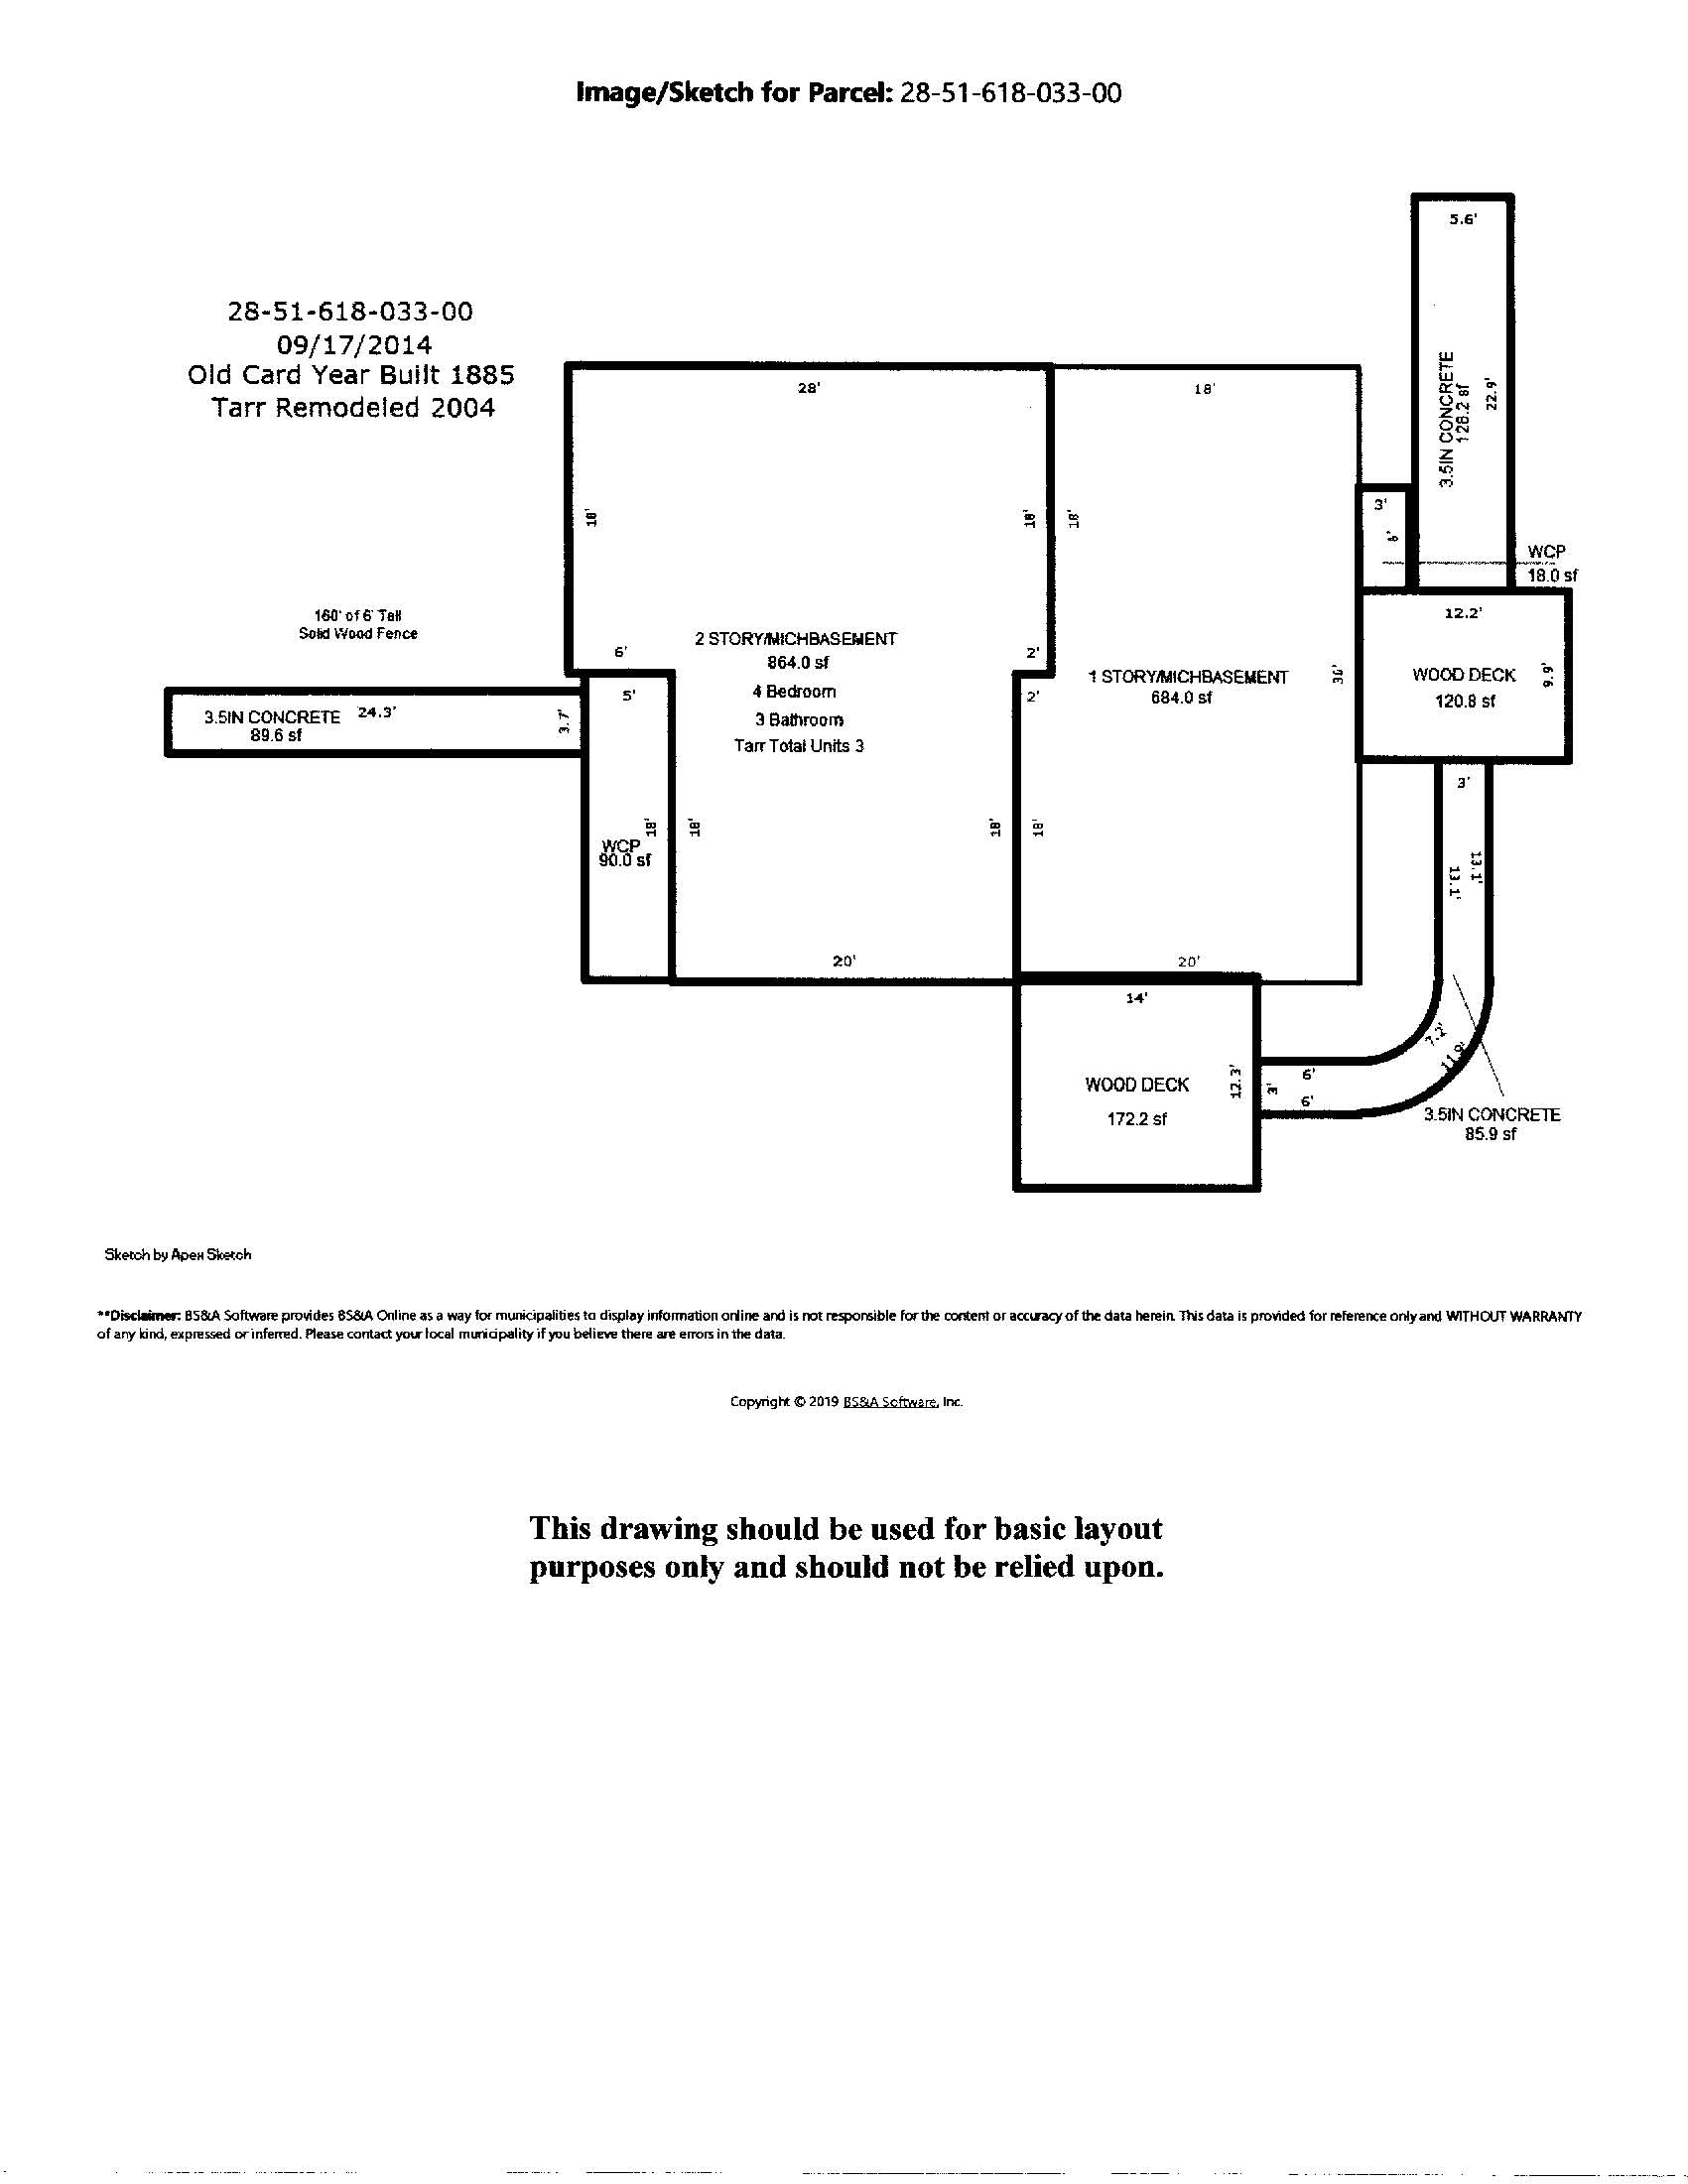 224 W Eighth St, Traverse City, MI – Downtown Traverse City Triplex Marketing Packet - For sale by Oltersdorf Realty LLC (21).jpg